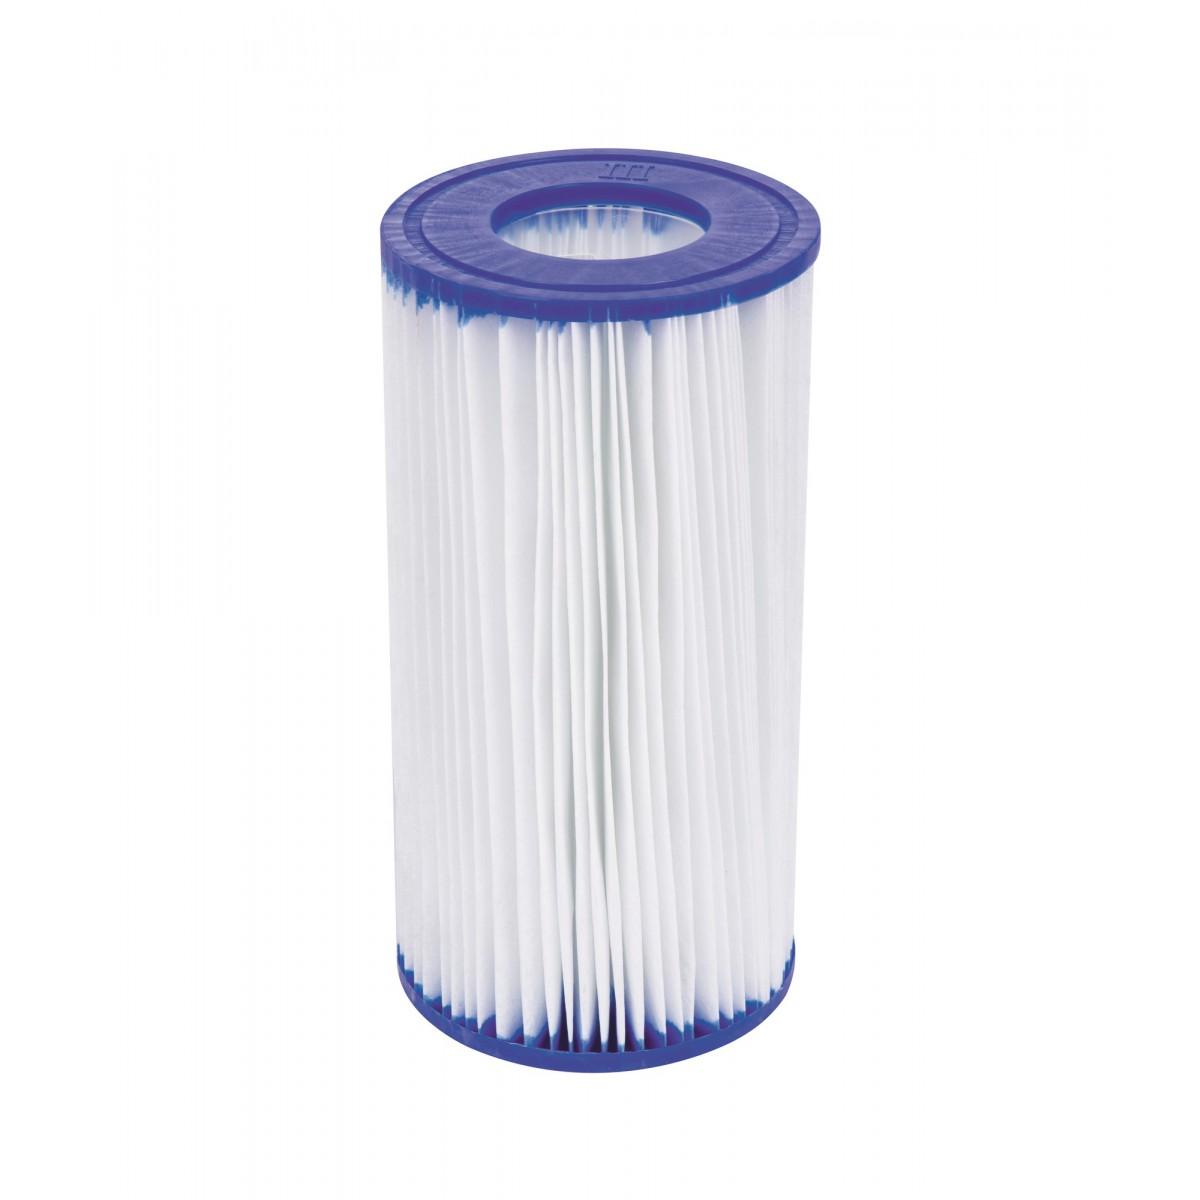 Cartouche de filtration piscine Type (III) Bestway - Diamètre 10,6 cm - Hauteur 20,3 cm